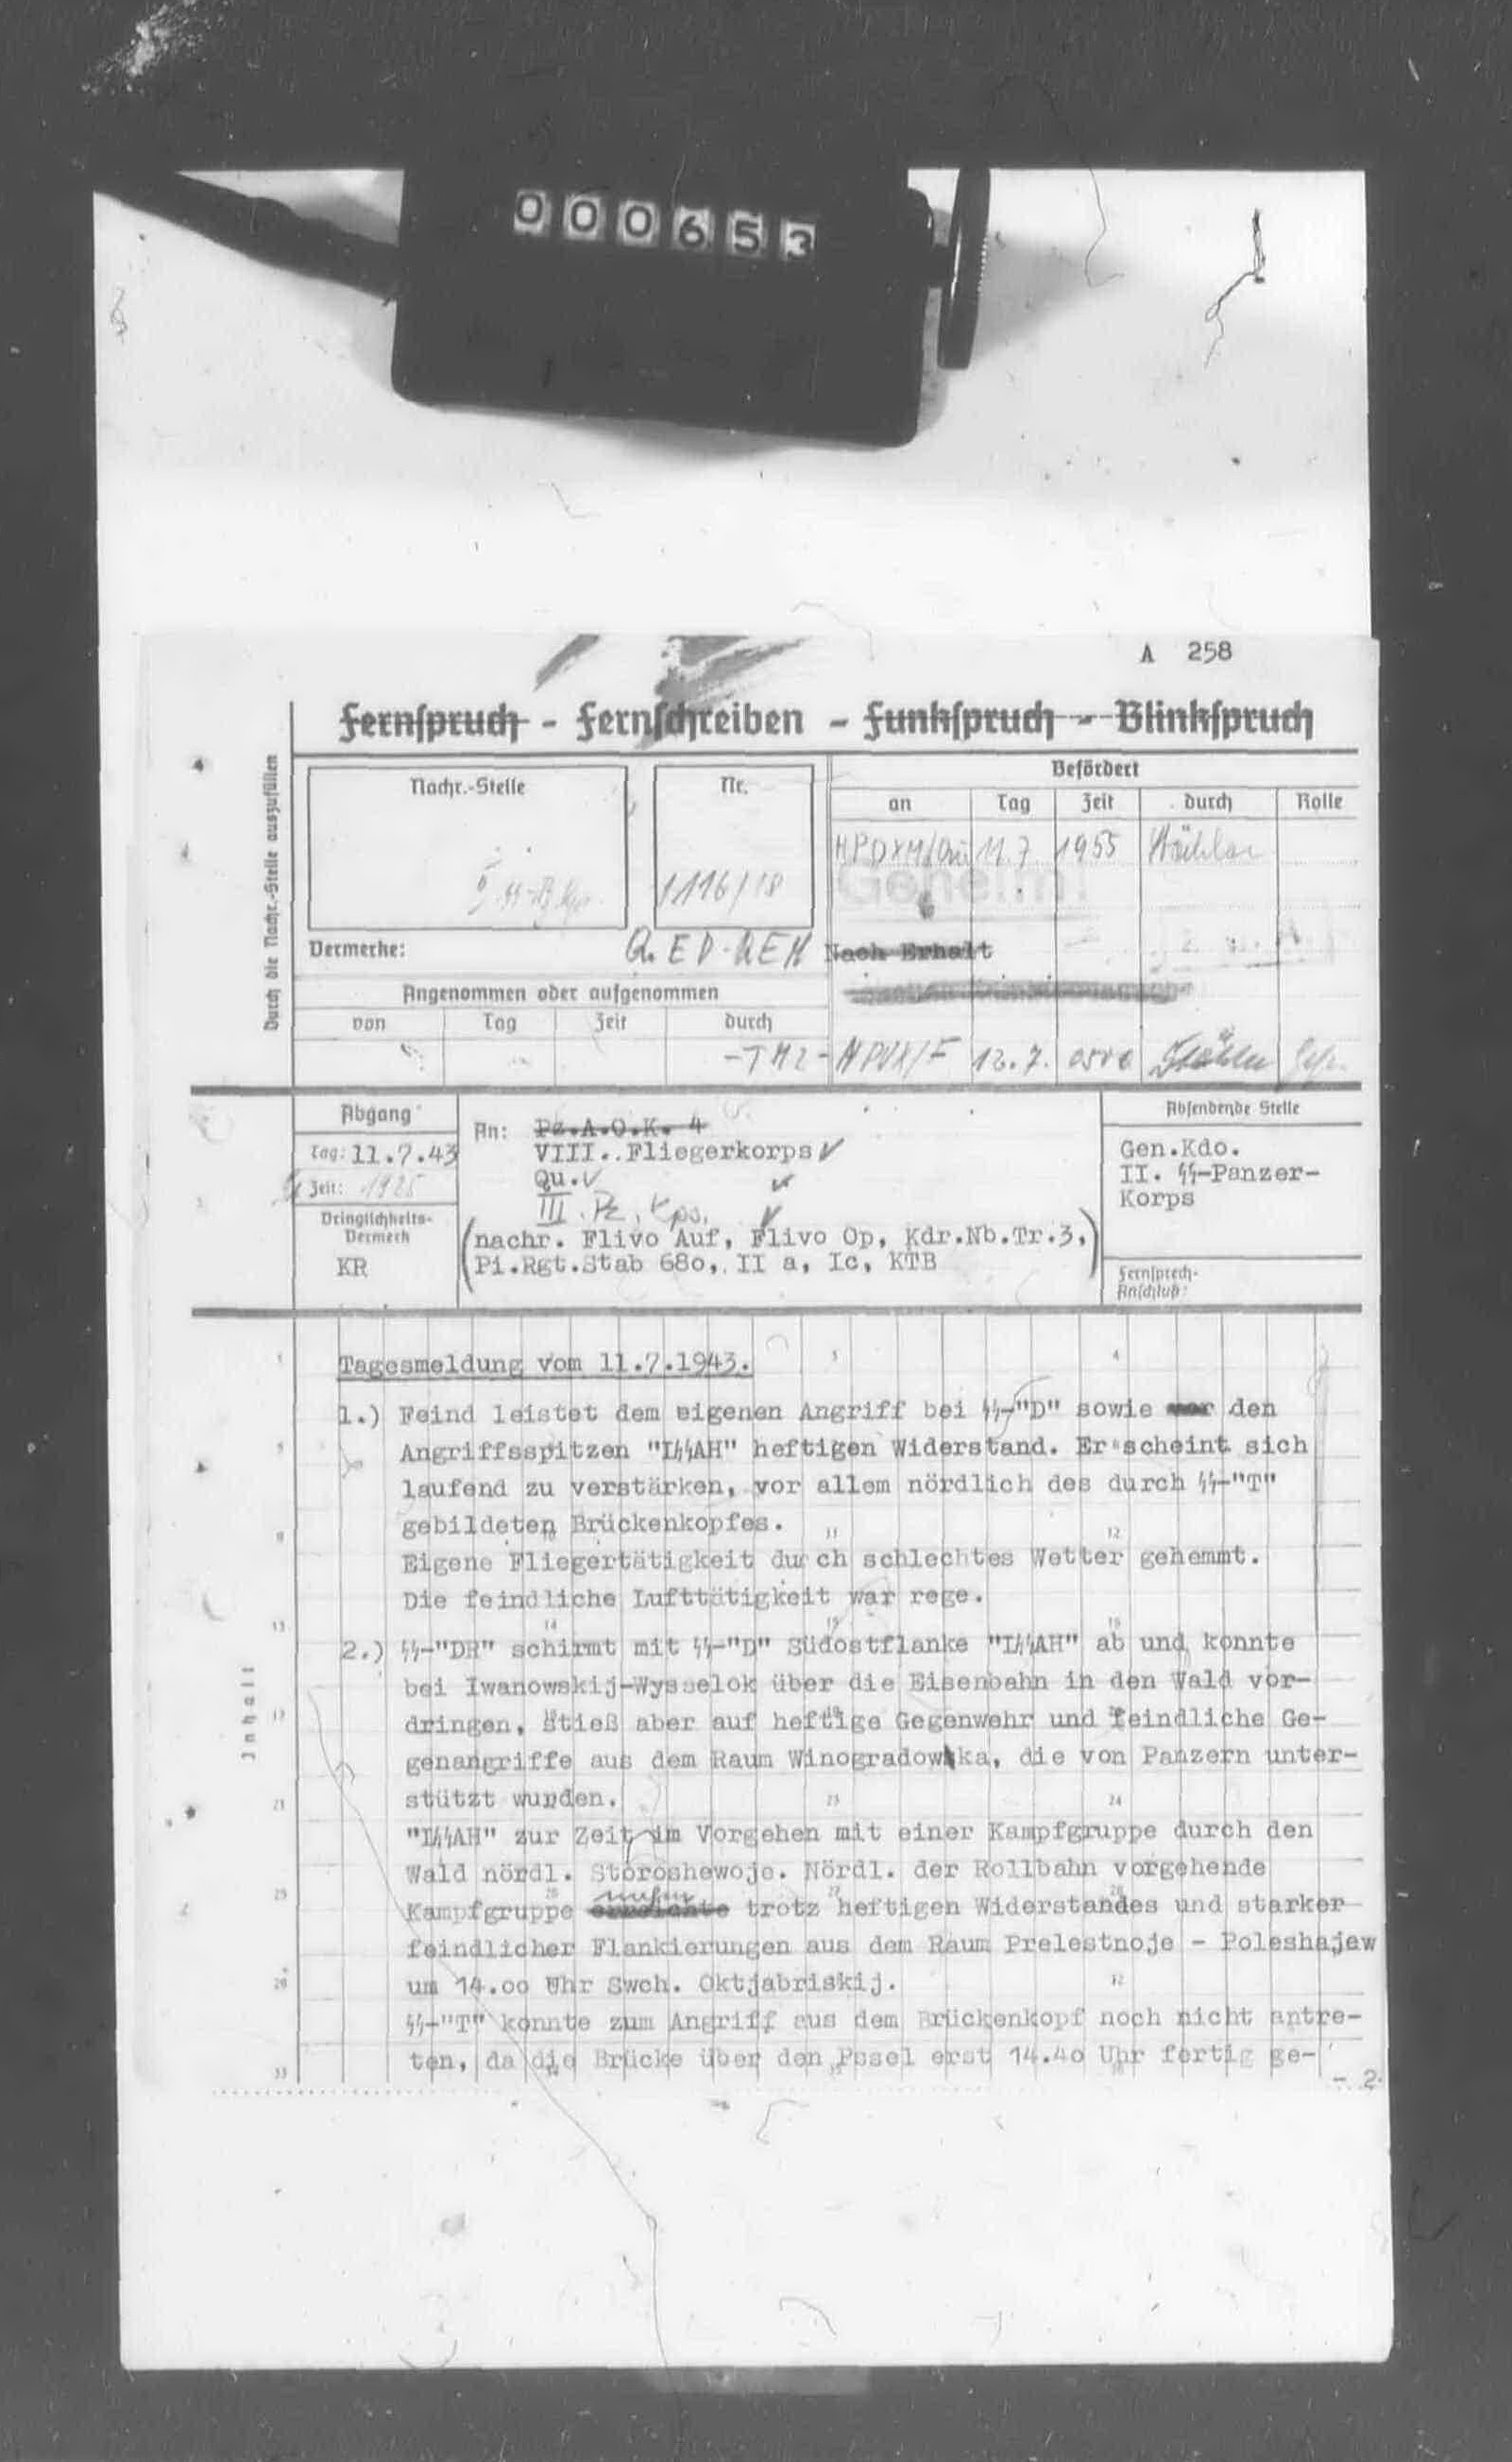 II. SS-Panzerkorps: Tagesmeldung vom 11.7.1943, 19:25. - PAGE 1